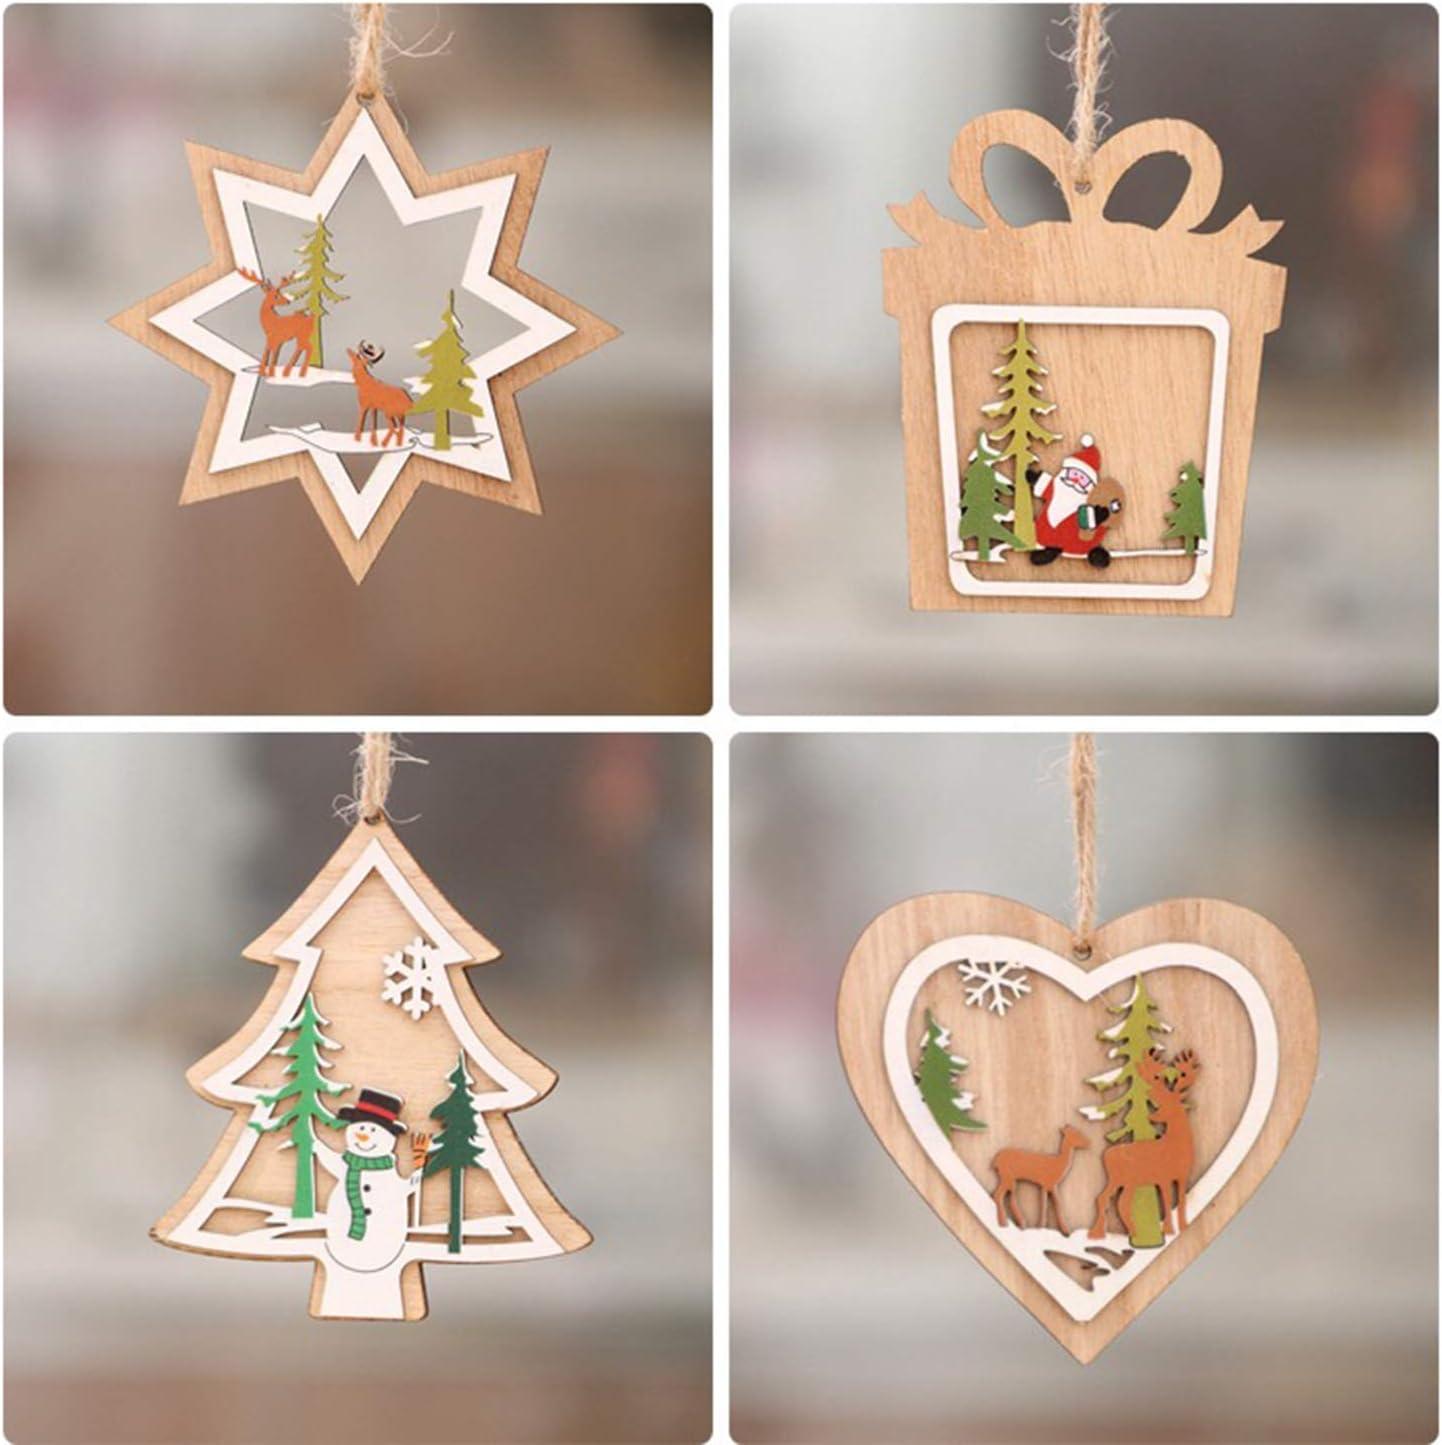 ACERANK Our shop most popular Christmas Decoration Flat Regular store Single Wooden Laser Piece Holl